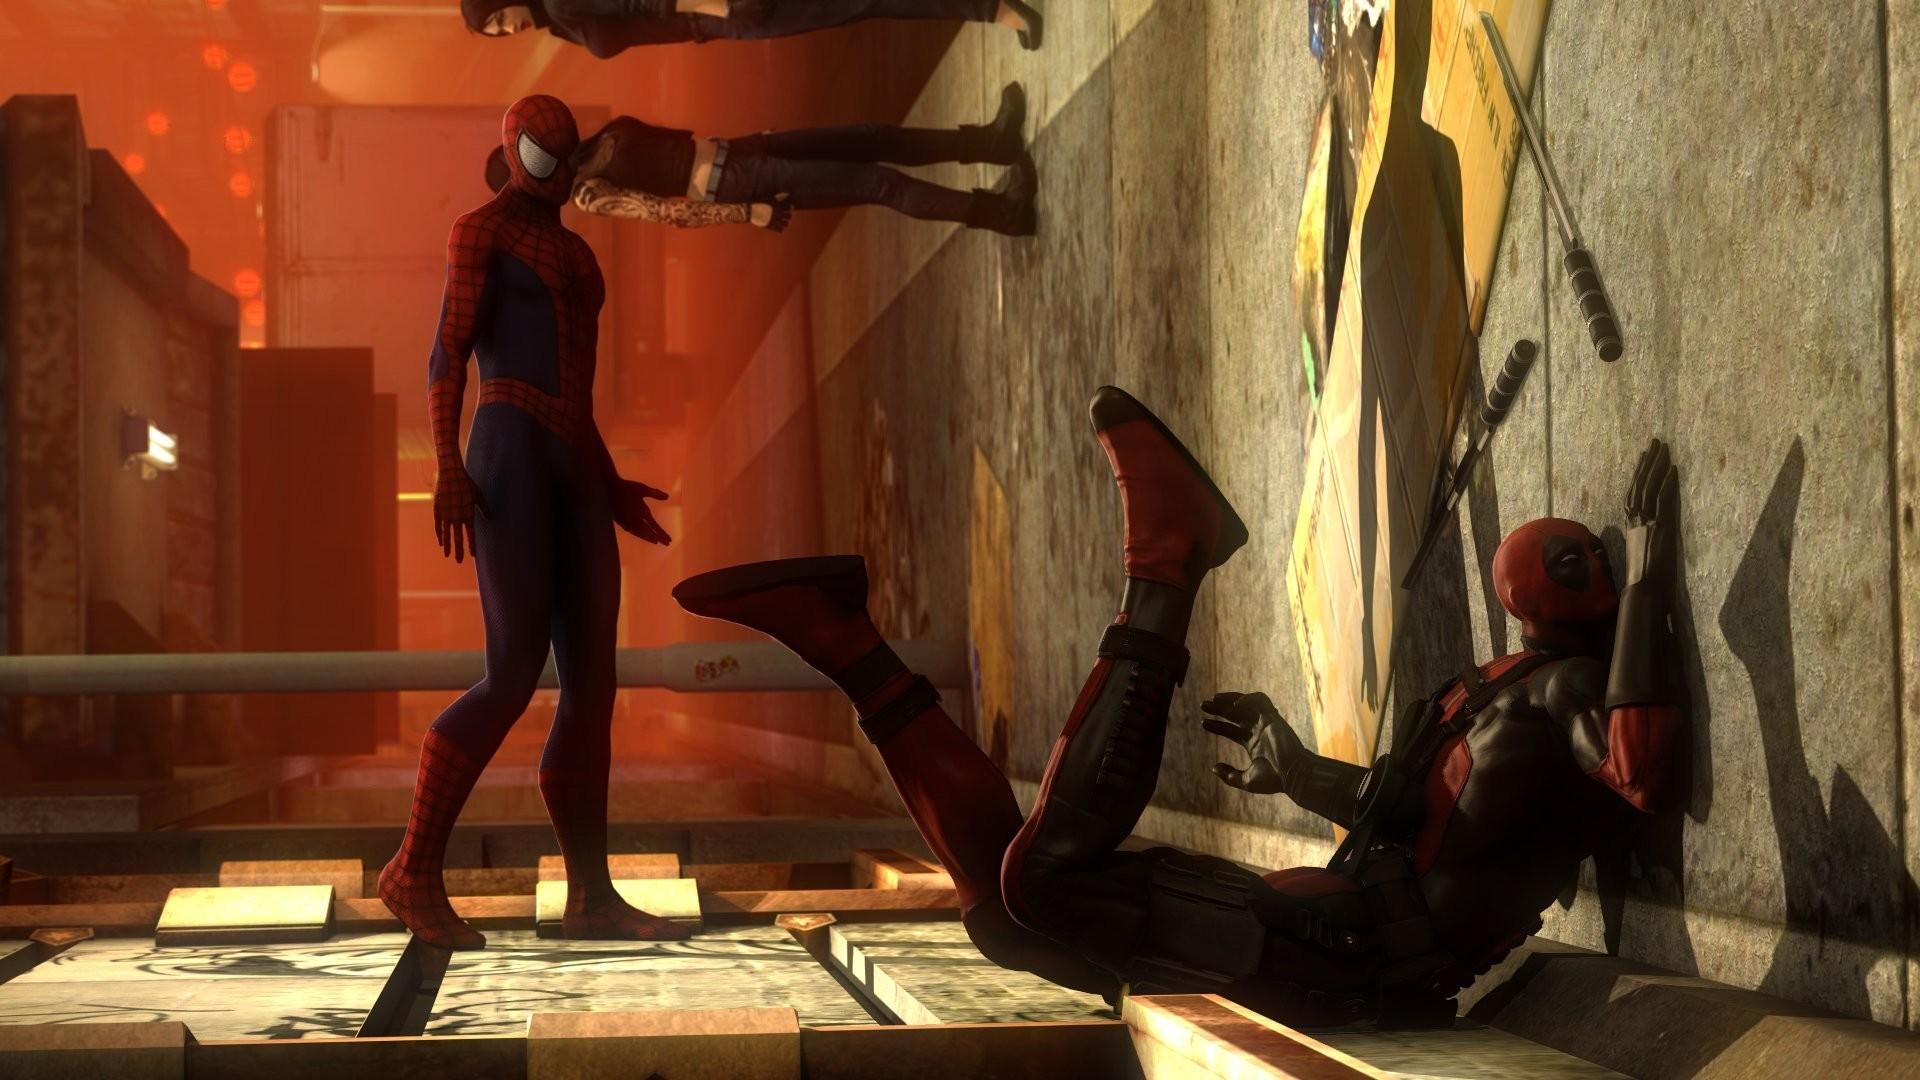 spider-man strike wall deadpool marvel comics